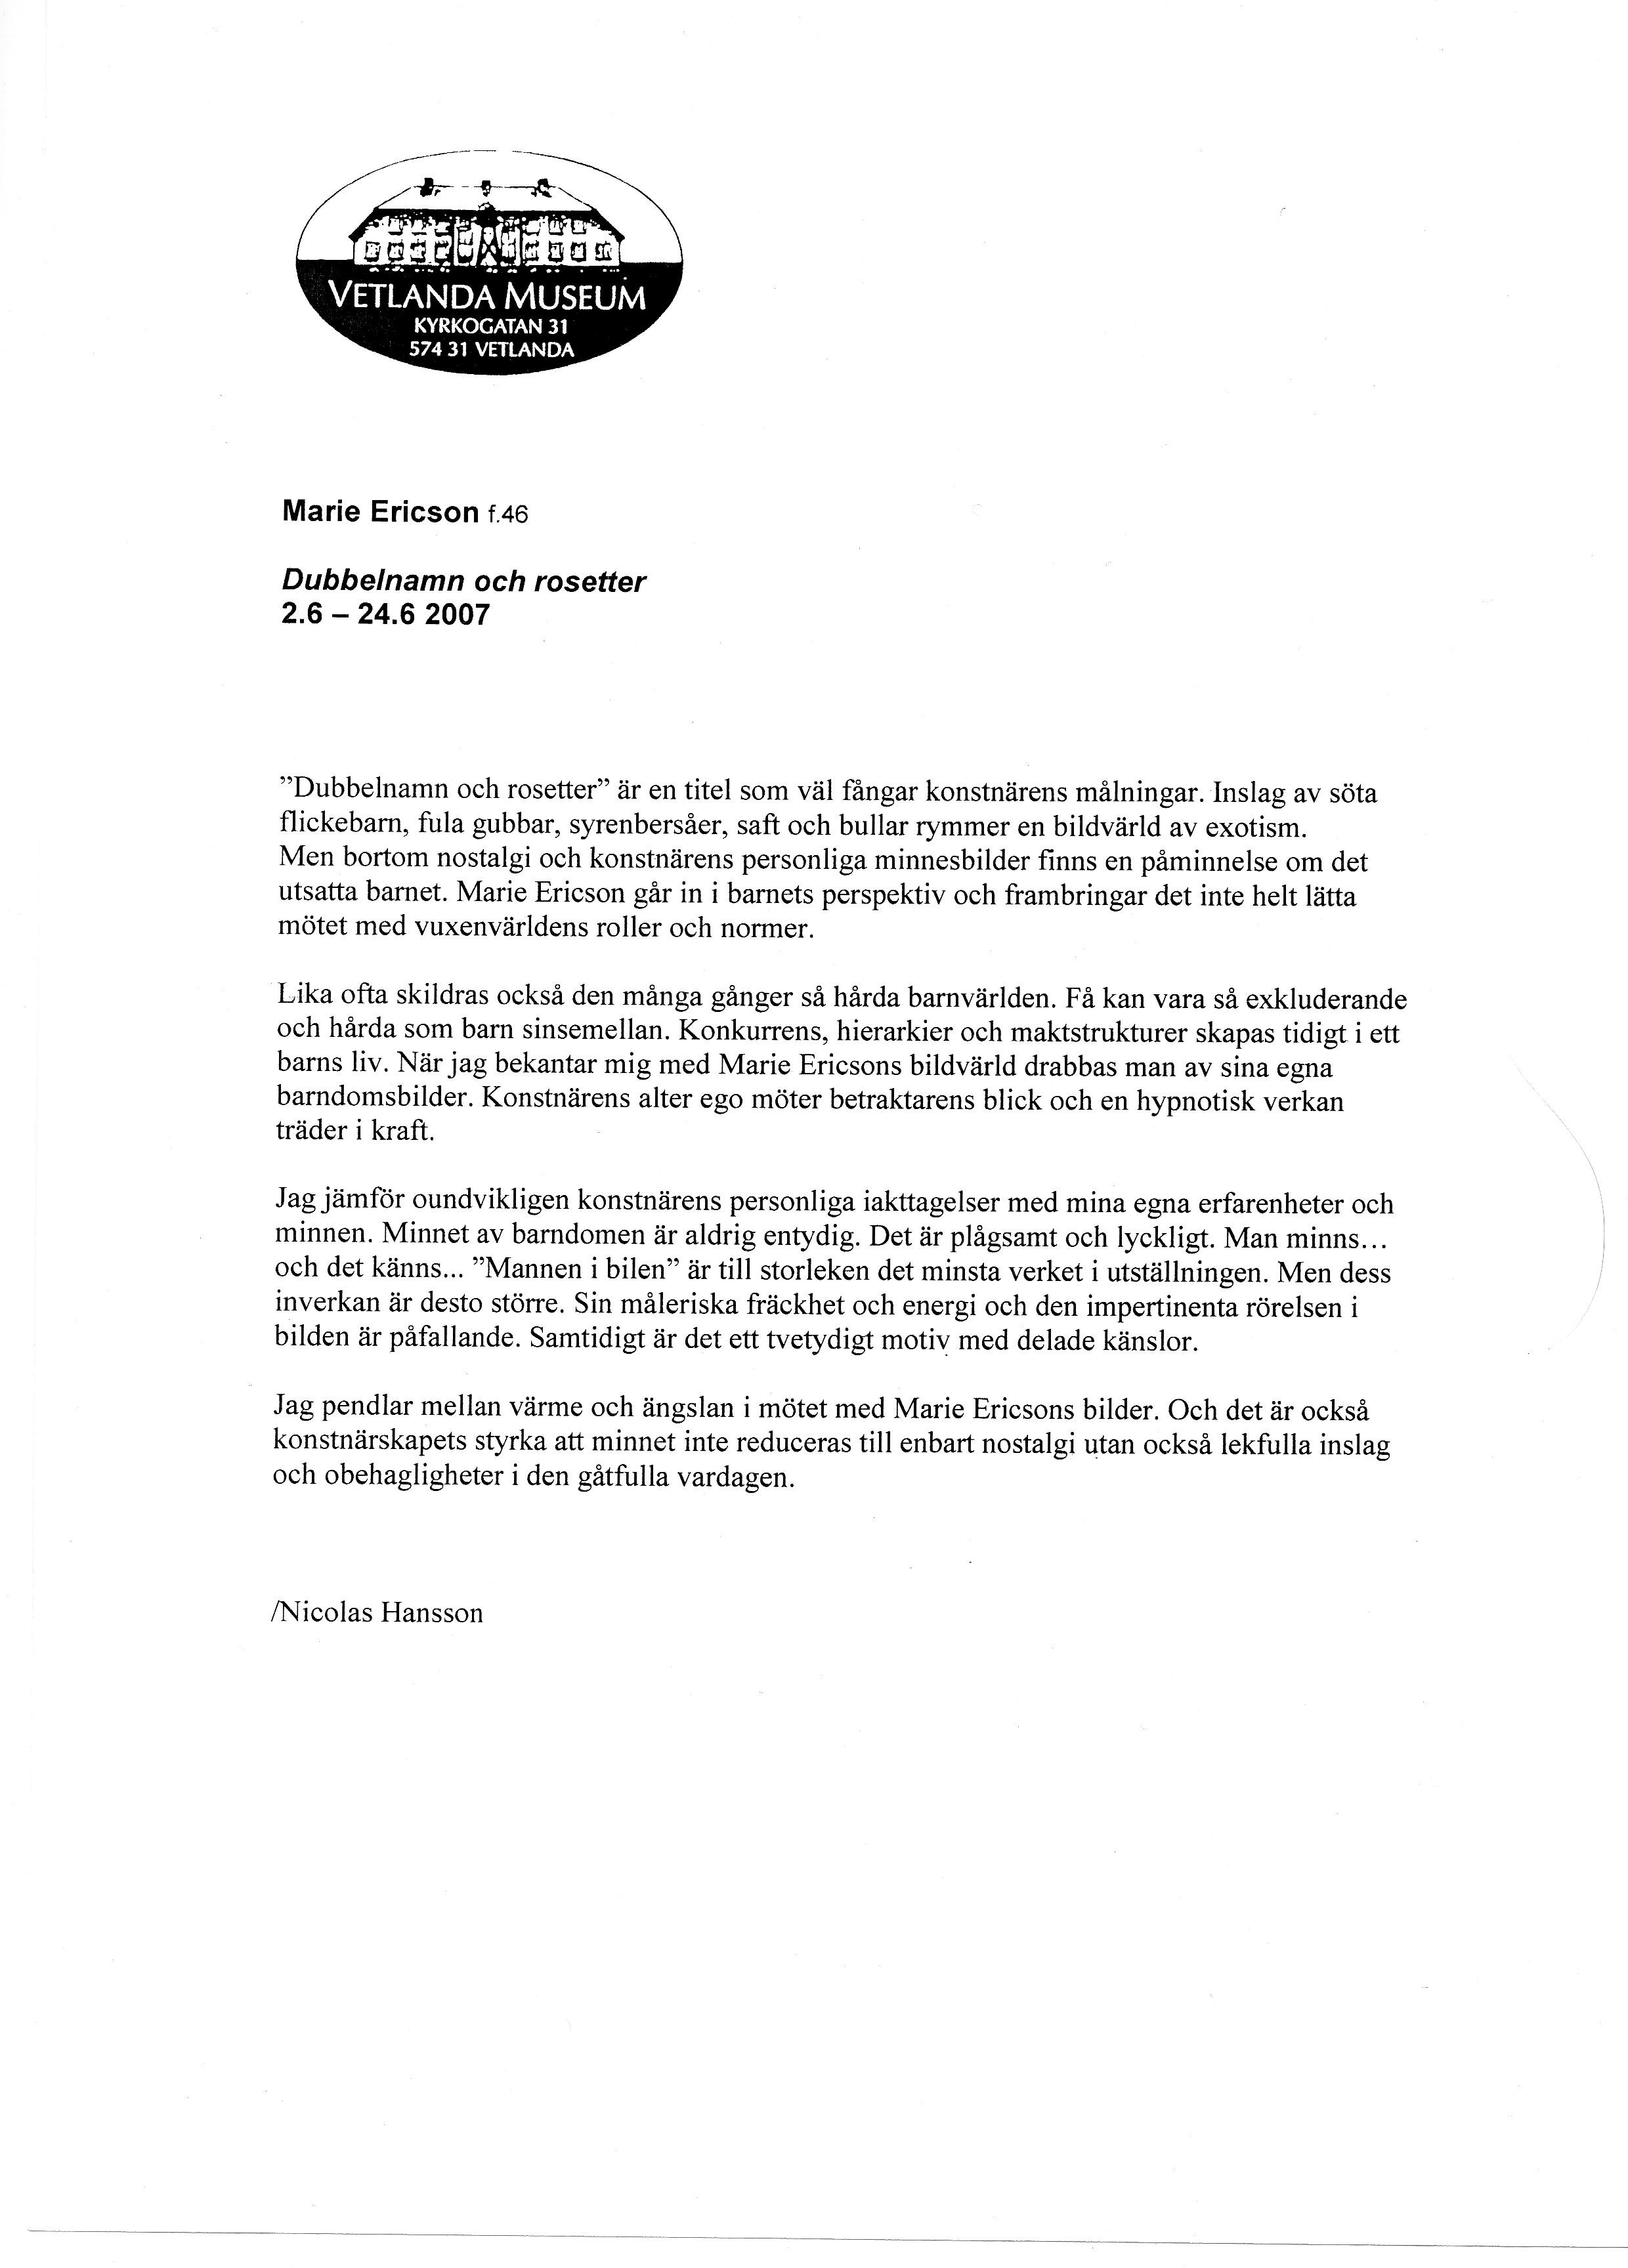 Nicolas Hansson Vetlanda museum inför utst